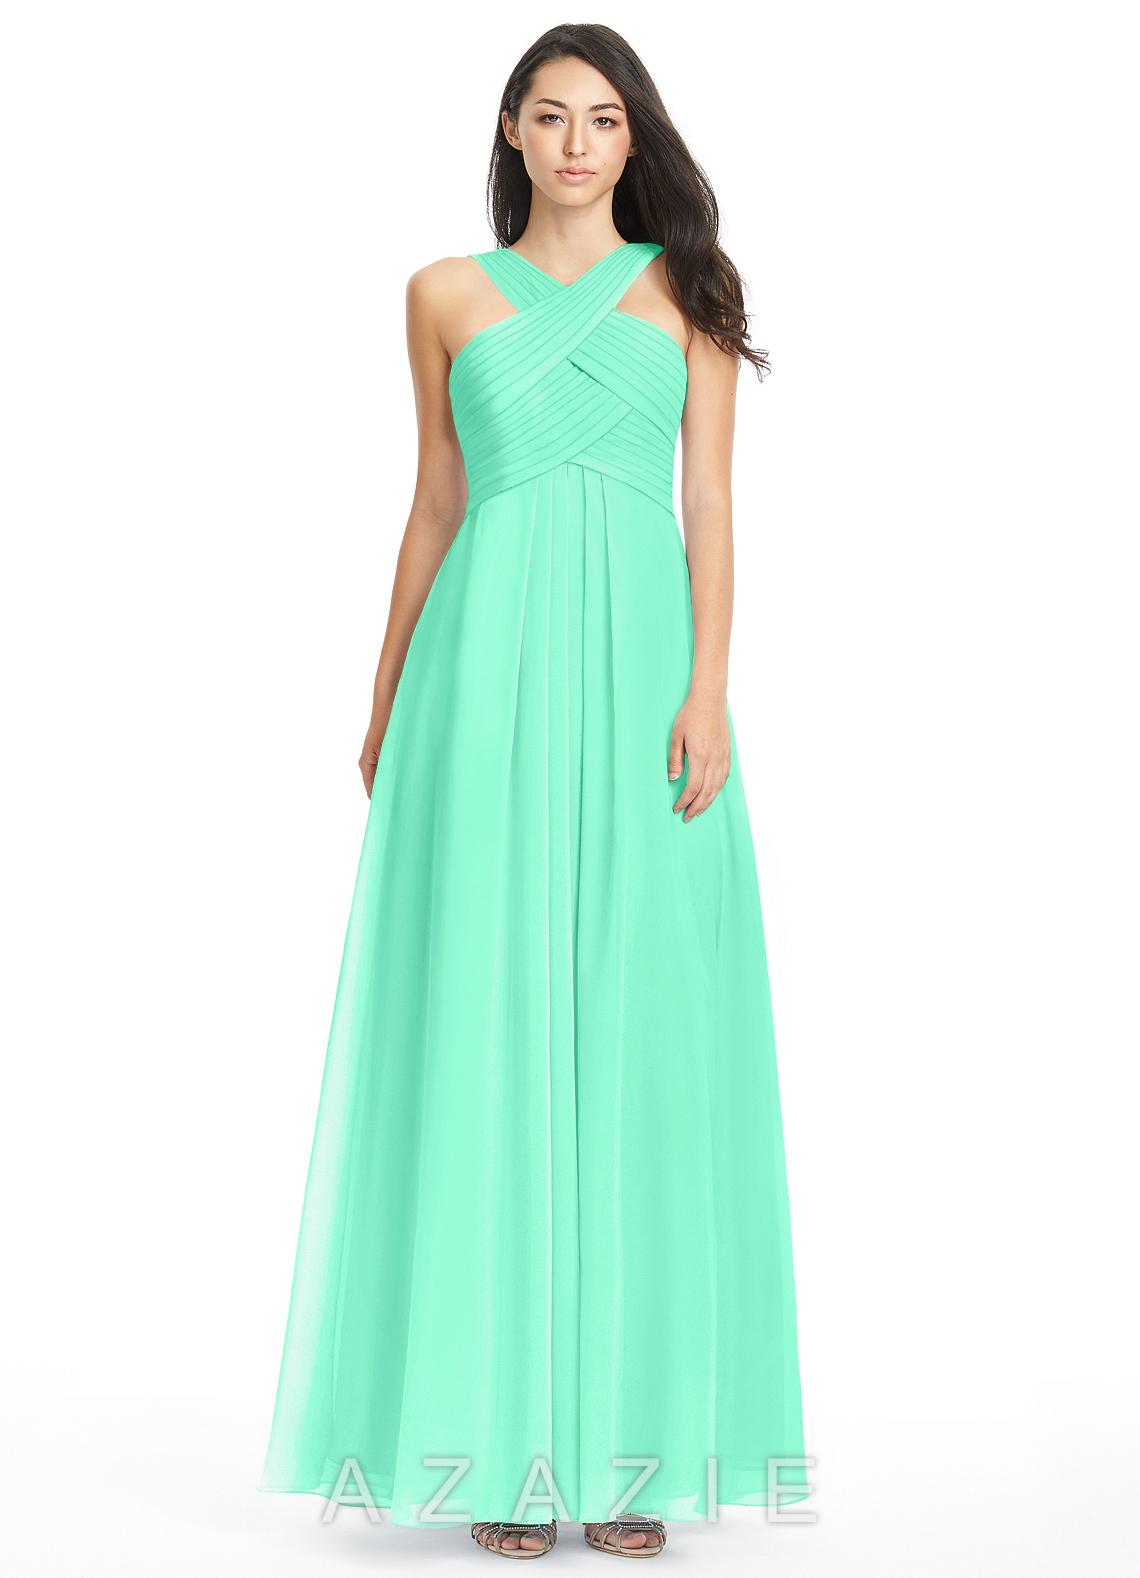 Azazie Kaleigh Bridesmaid Dress | Azazie